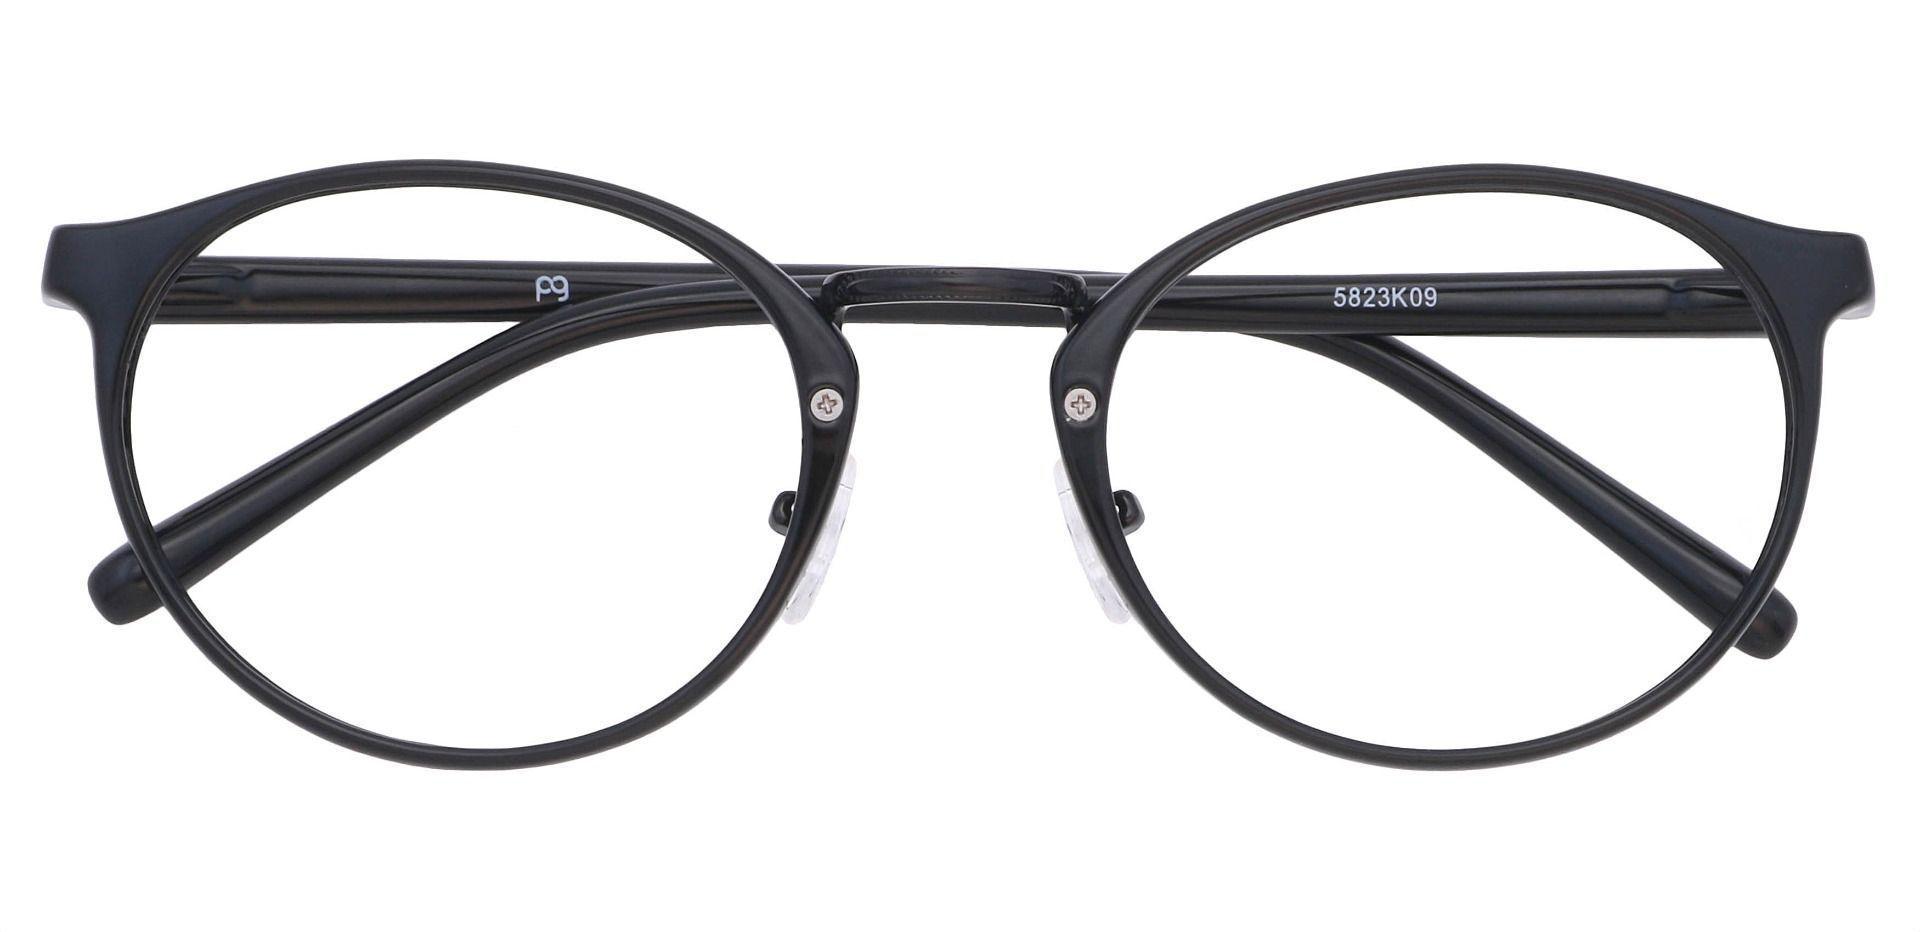 Bloom Oval Prescription Glasses - Black